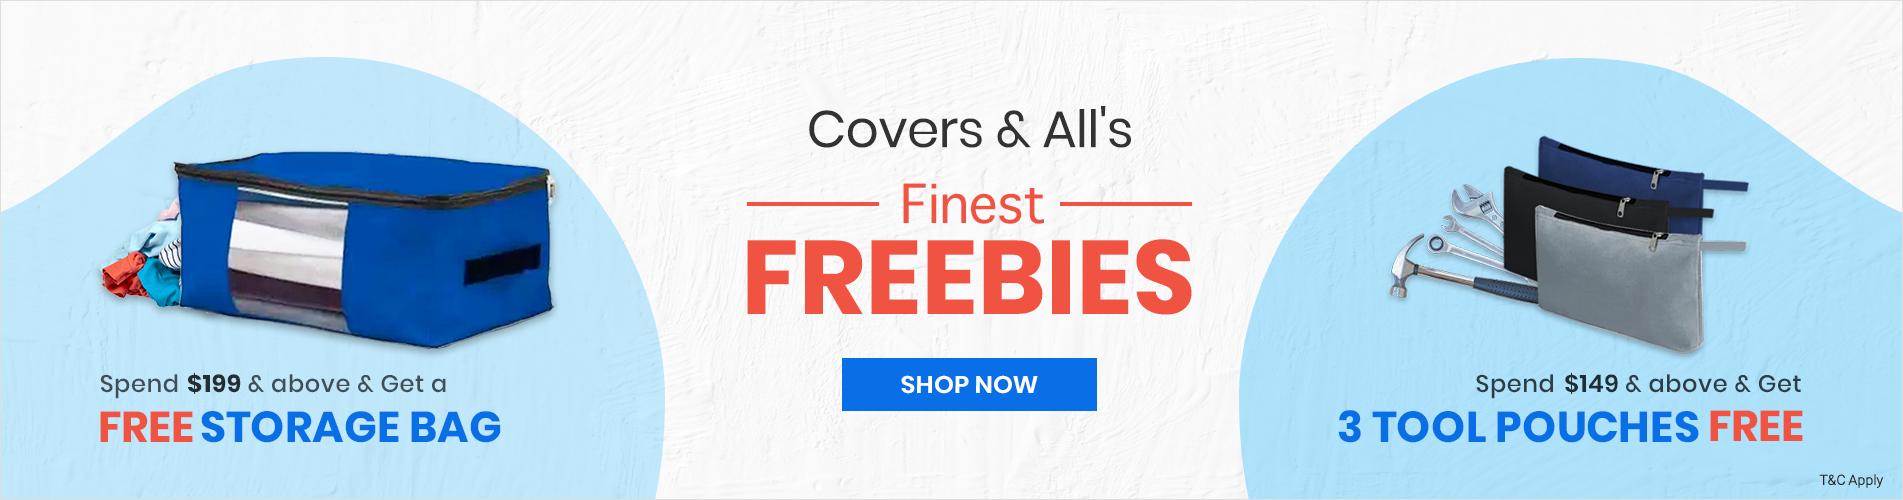 Finest Freebies